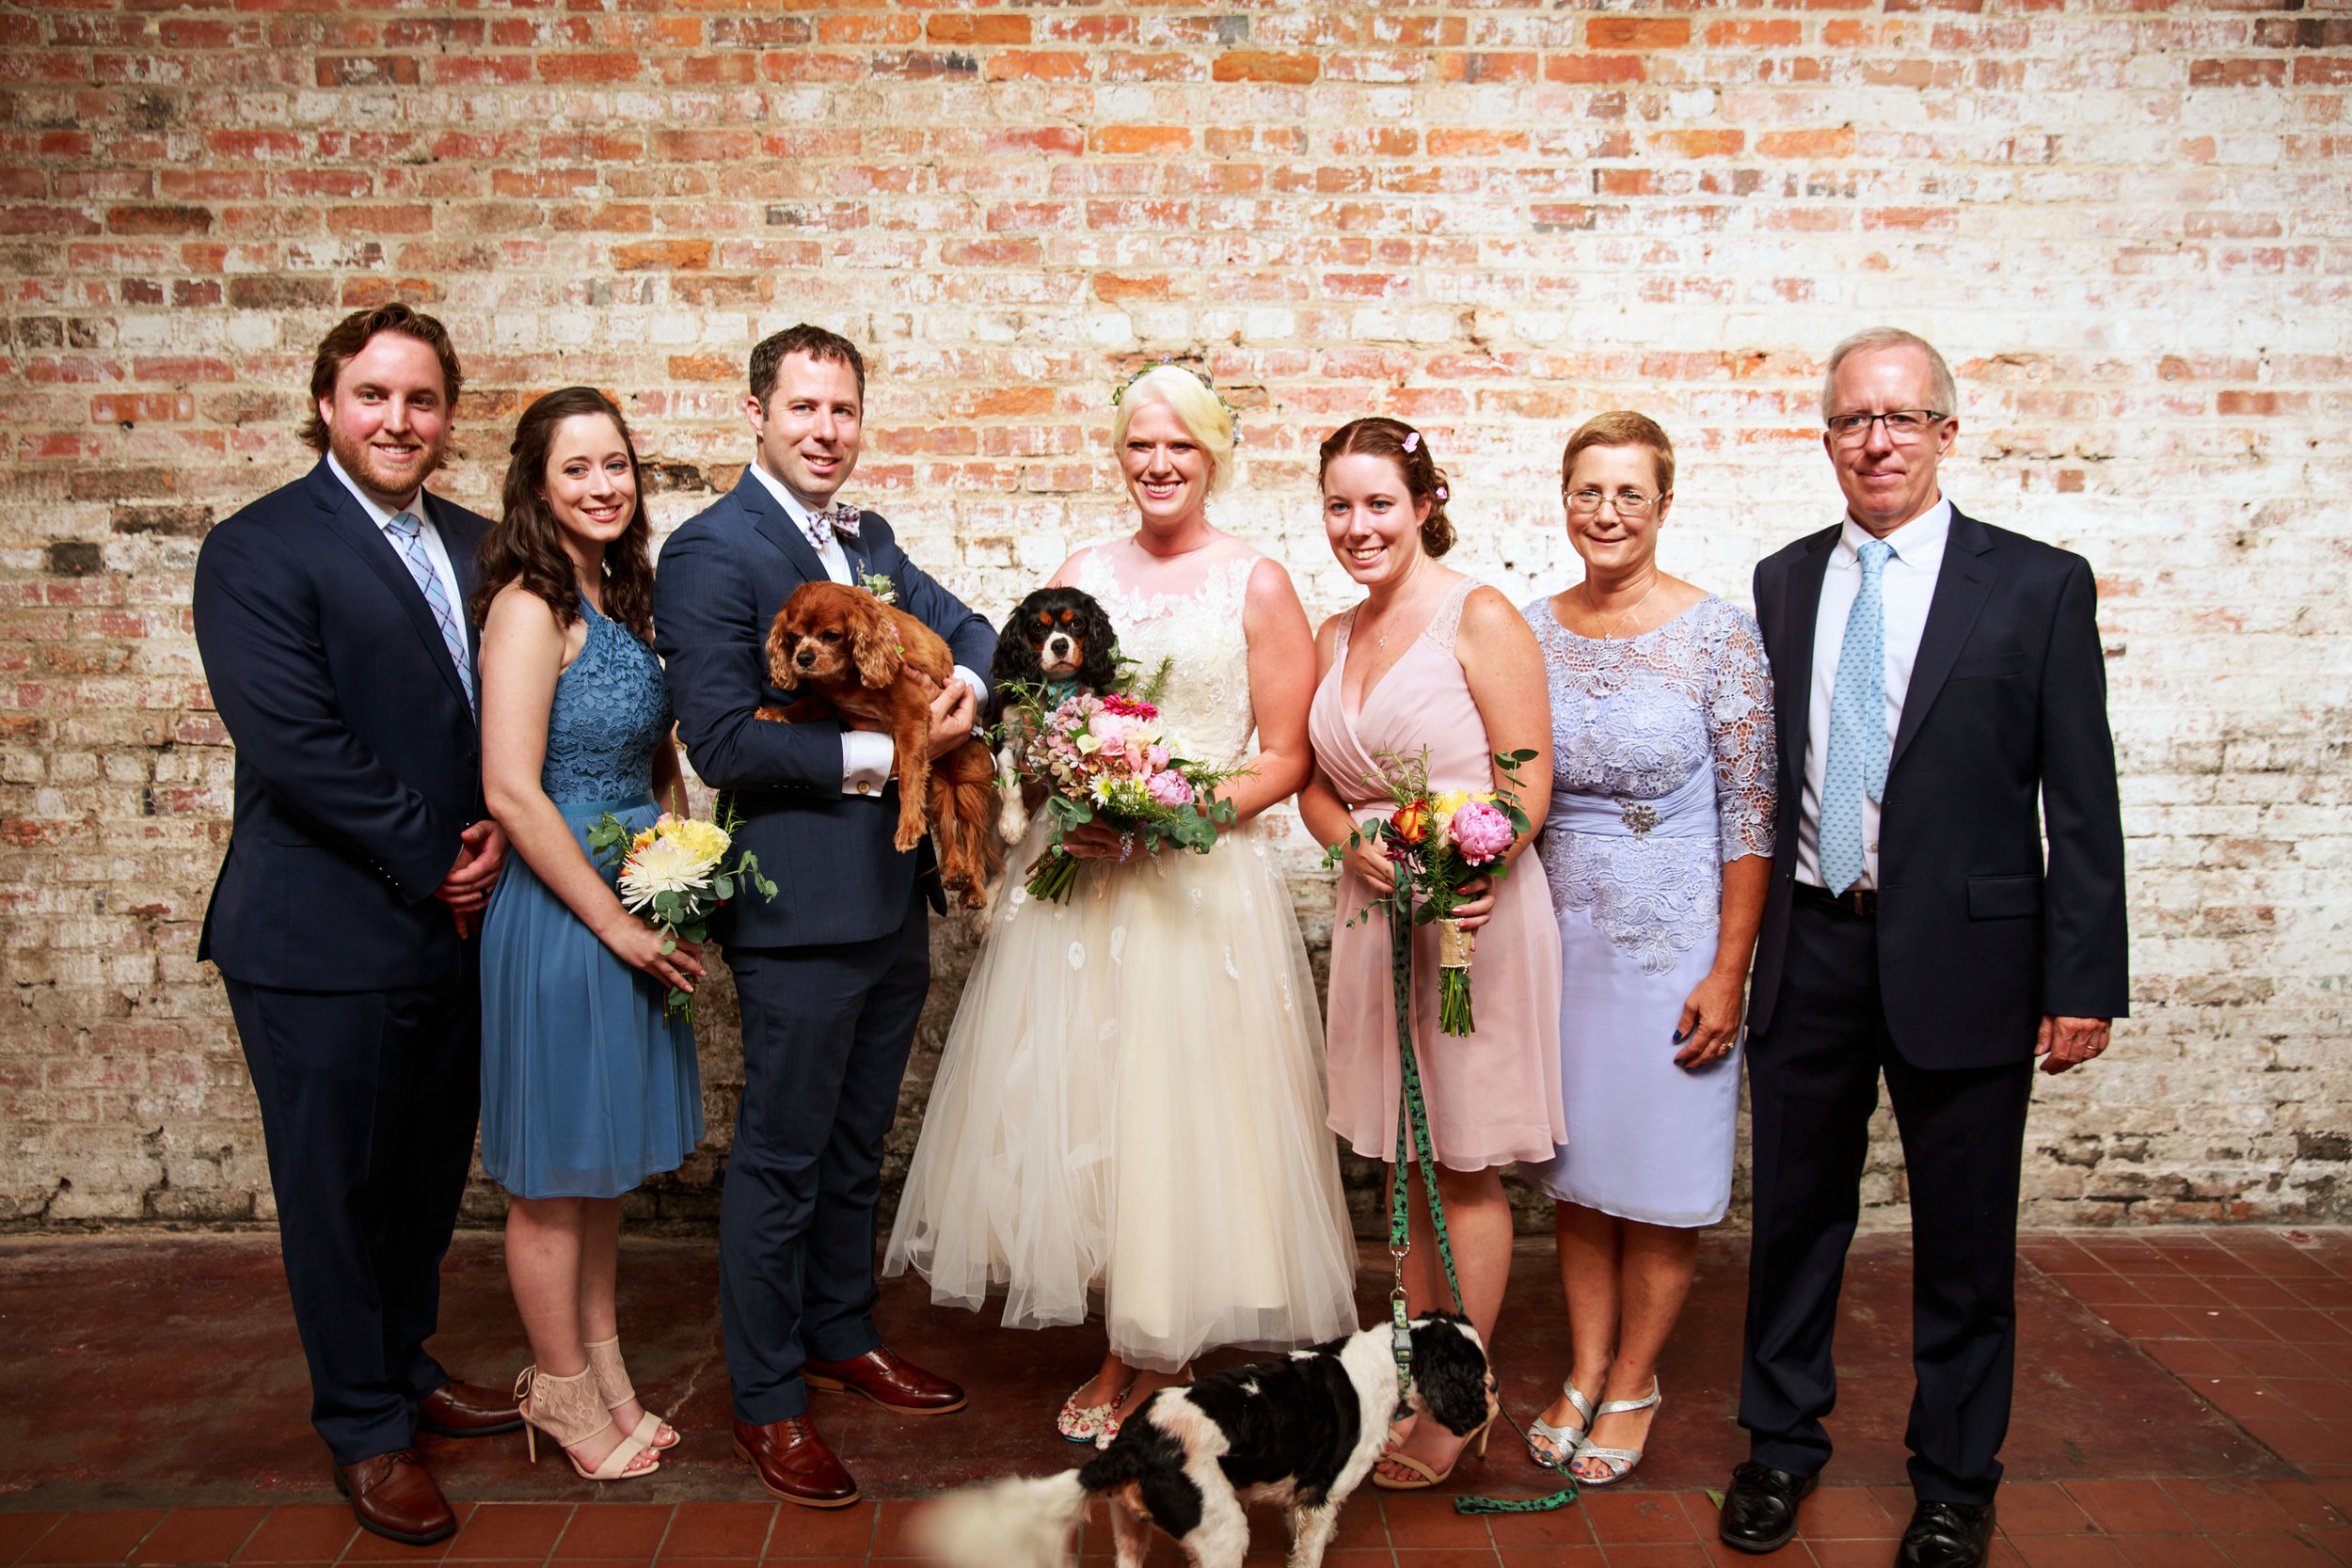 128-South-Wedding-Tiffany-Abruzzo-Photography-Group-046.jpg